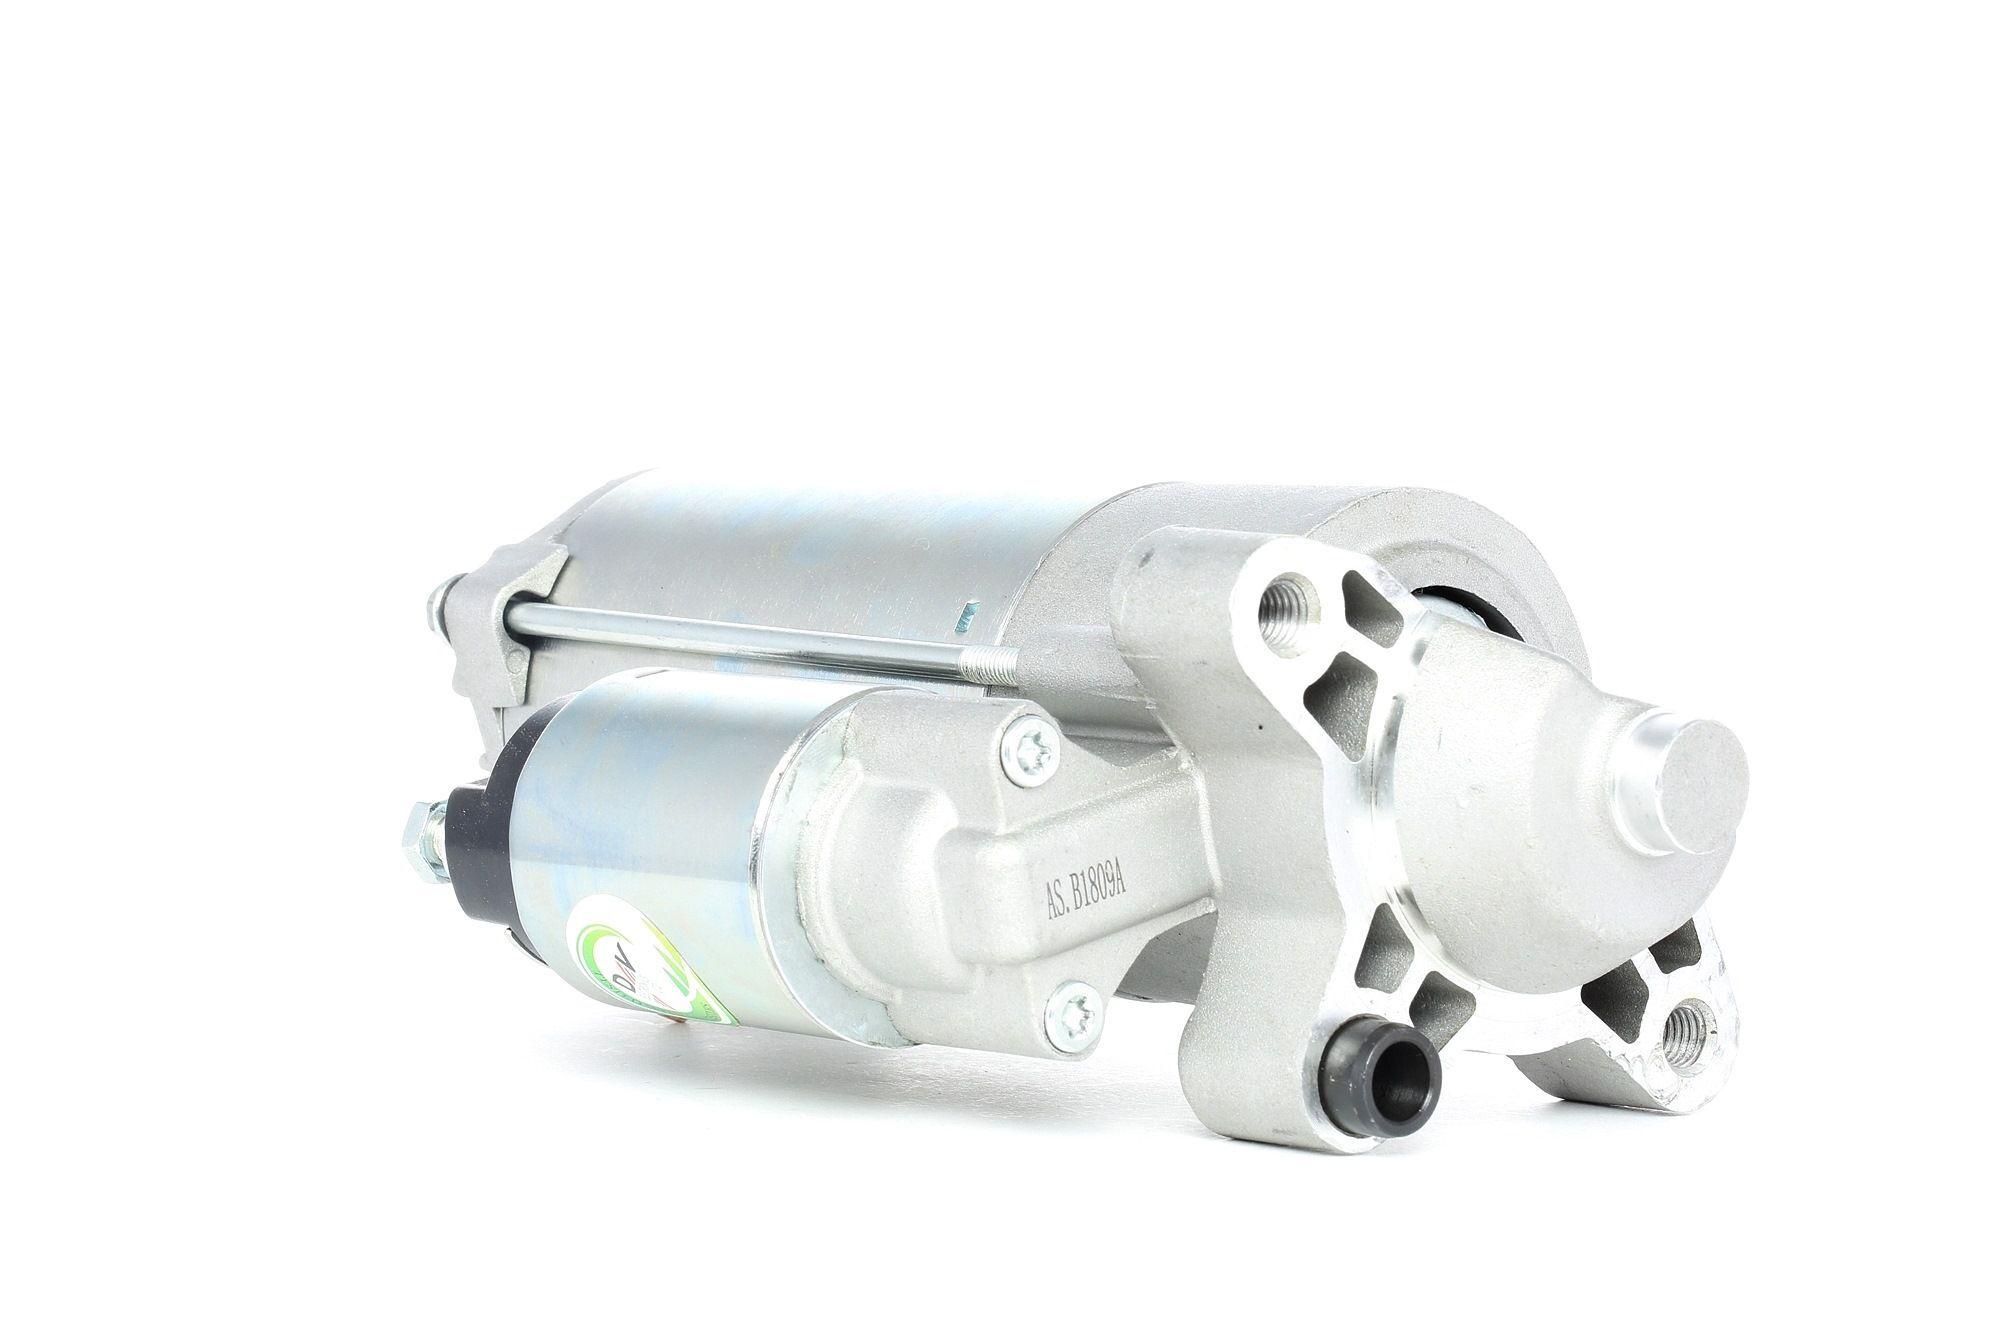 AS-PL Starttimoottori Brand new AS-PL Alternator D.E. bracket S9033 Startti,Käynnistinmoottori VOLVO,FORD,V50 MW,V70 III BW,C30,S40 II MS